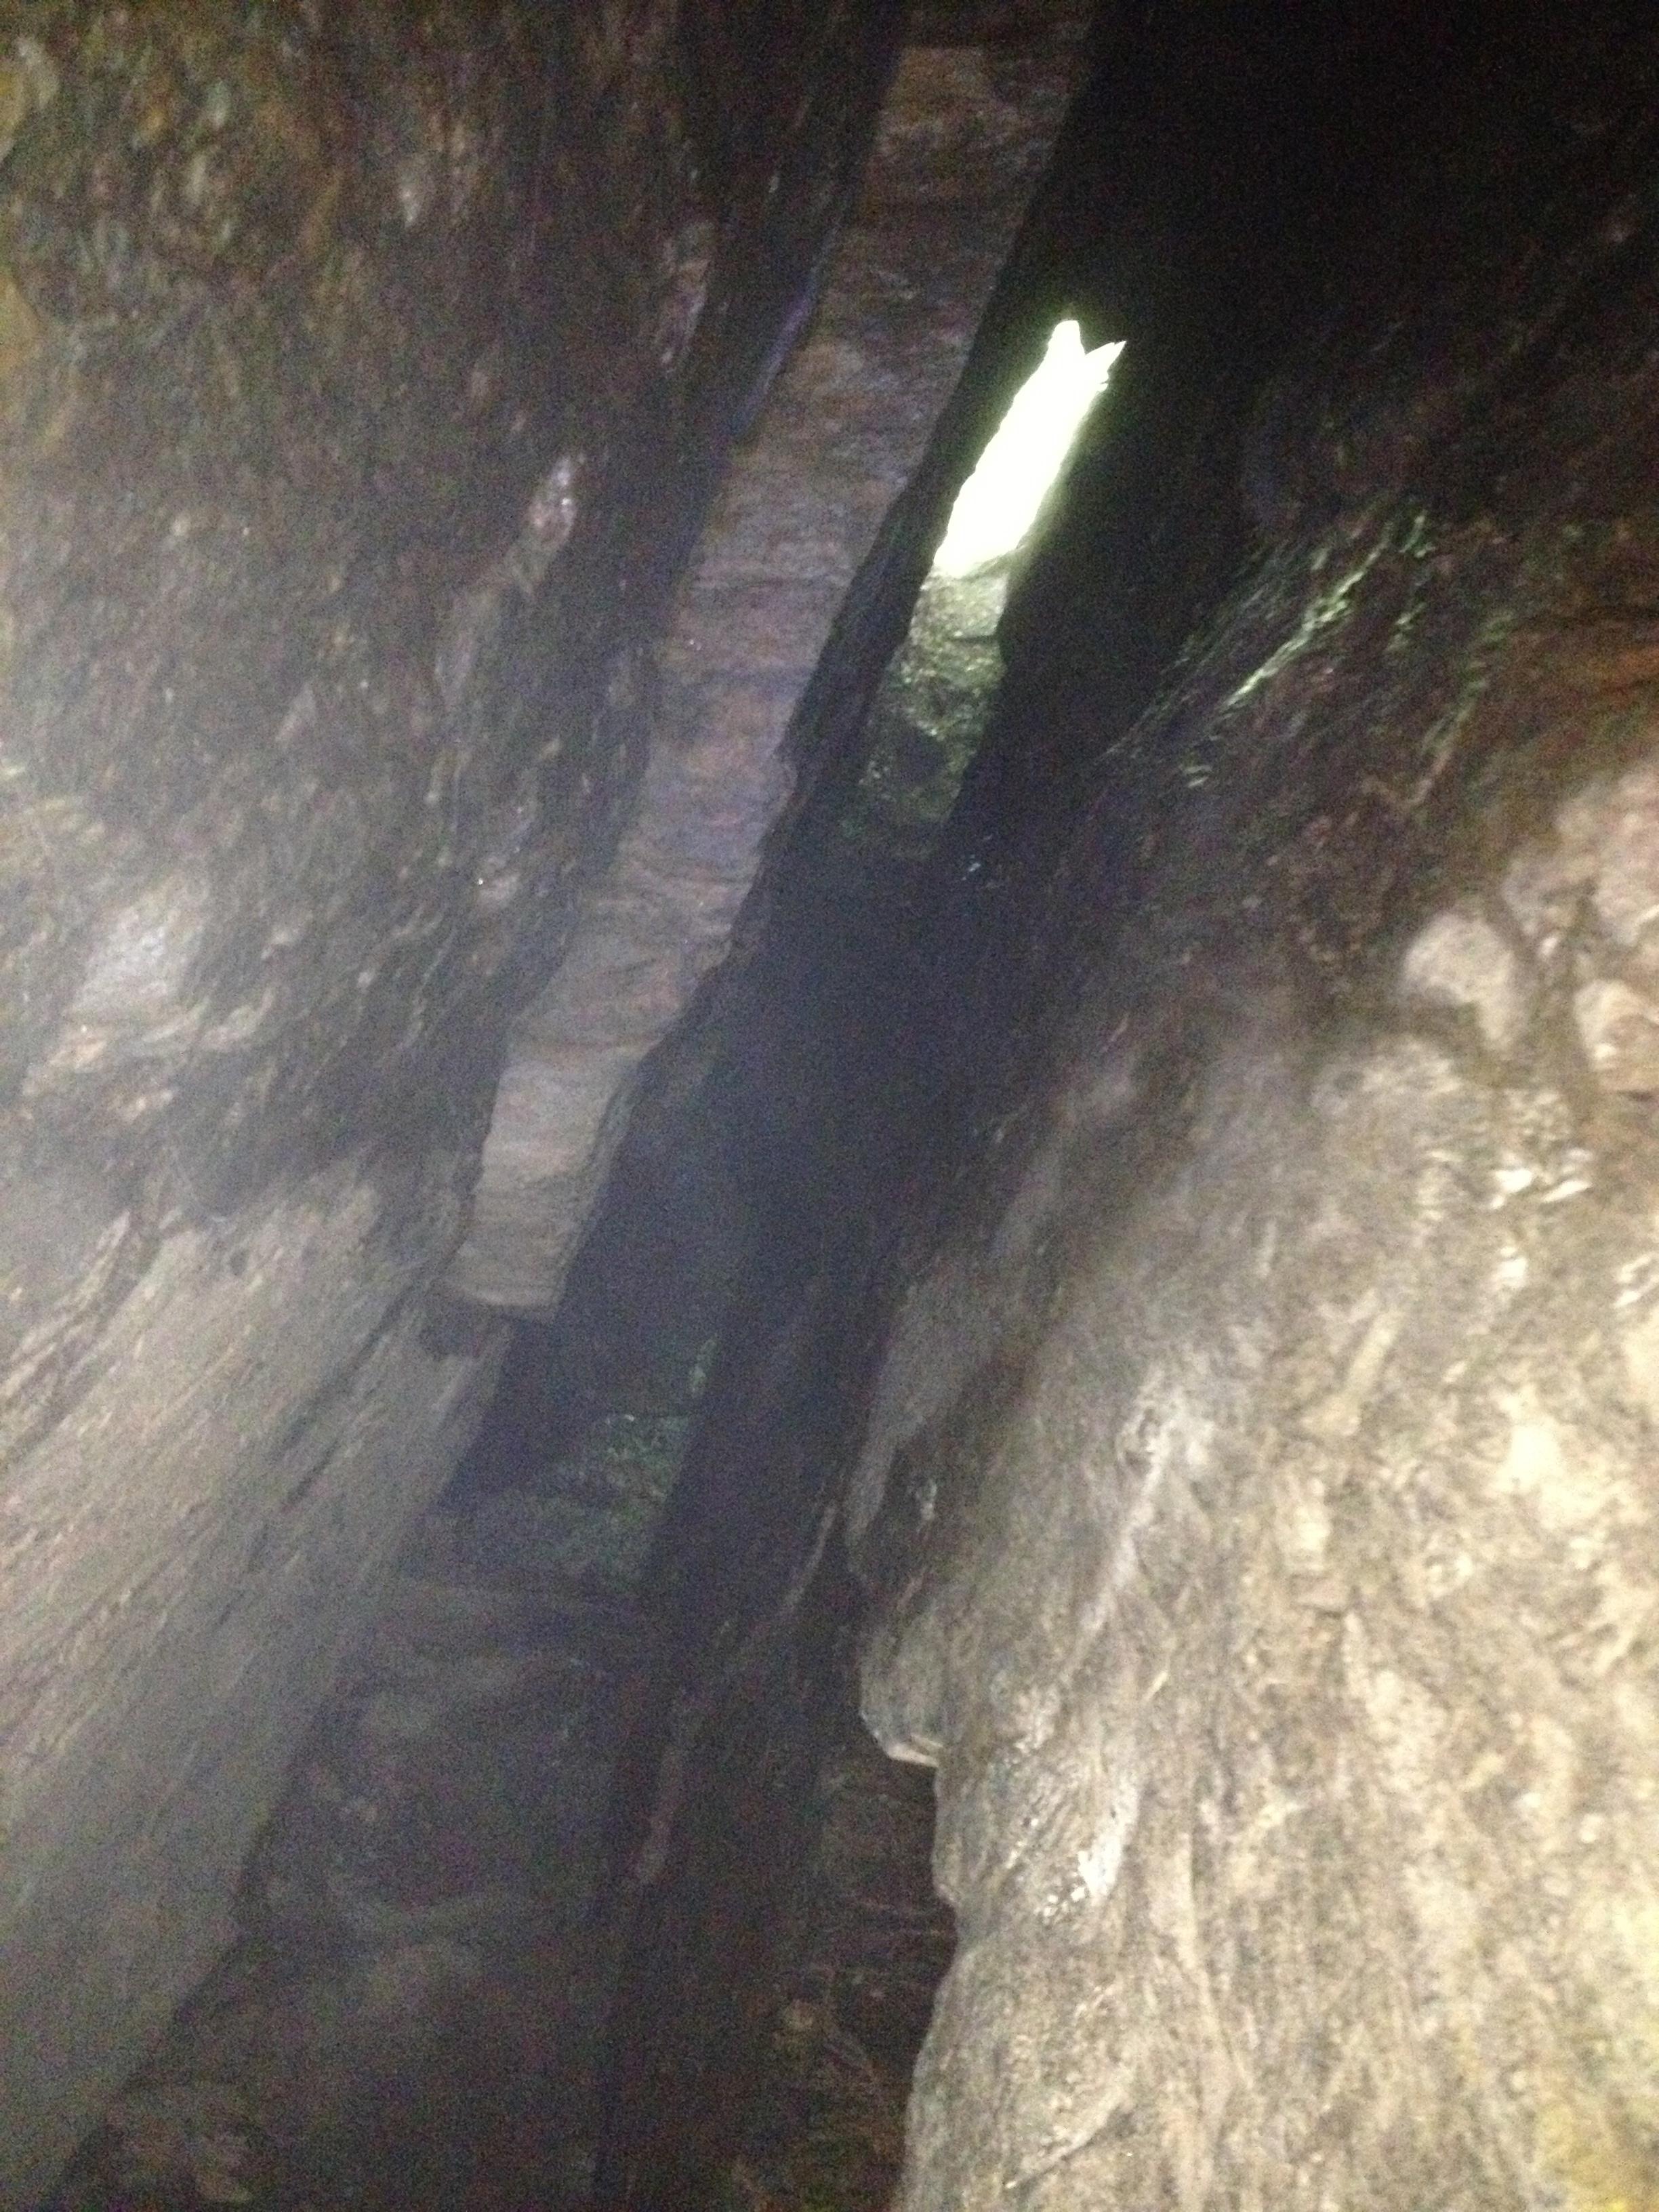 the underground of the conestoga trail cold cave wind cave the underground of the conestoga trail cold cave wind cave trevor s hiking blog